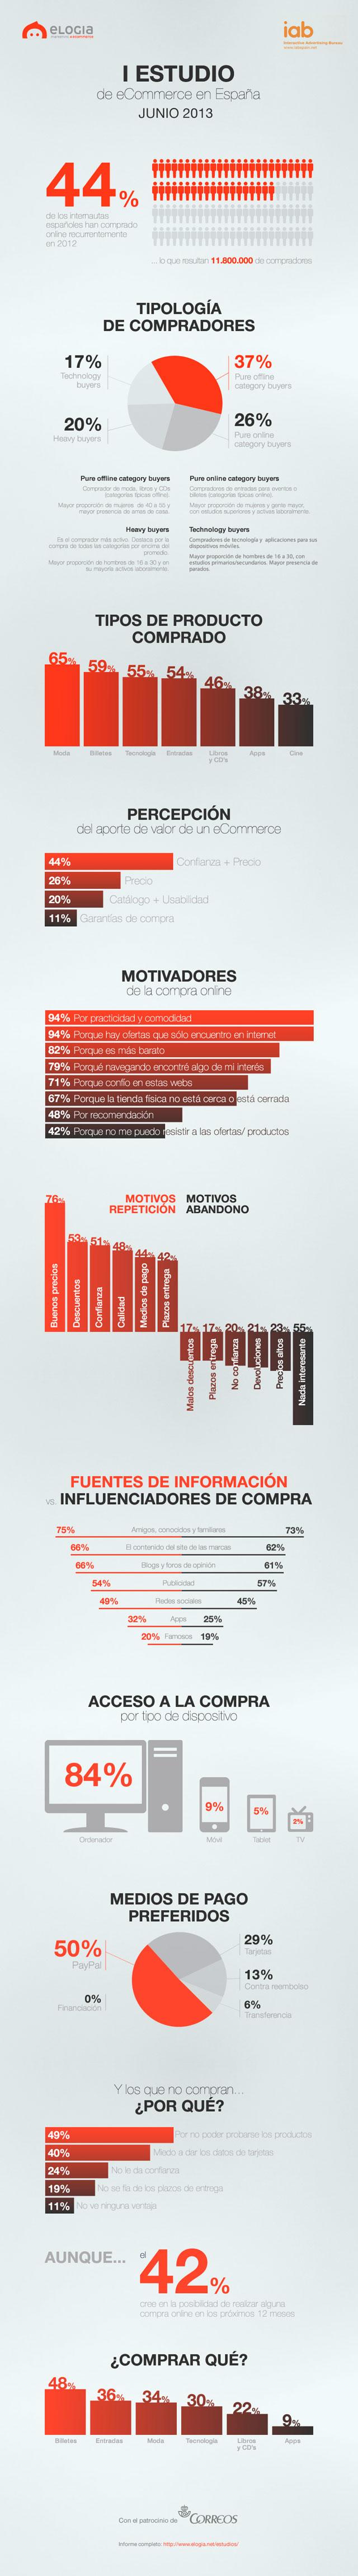 Estudio sobre comercio electrónico en España